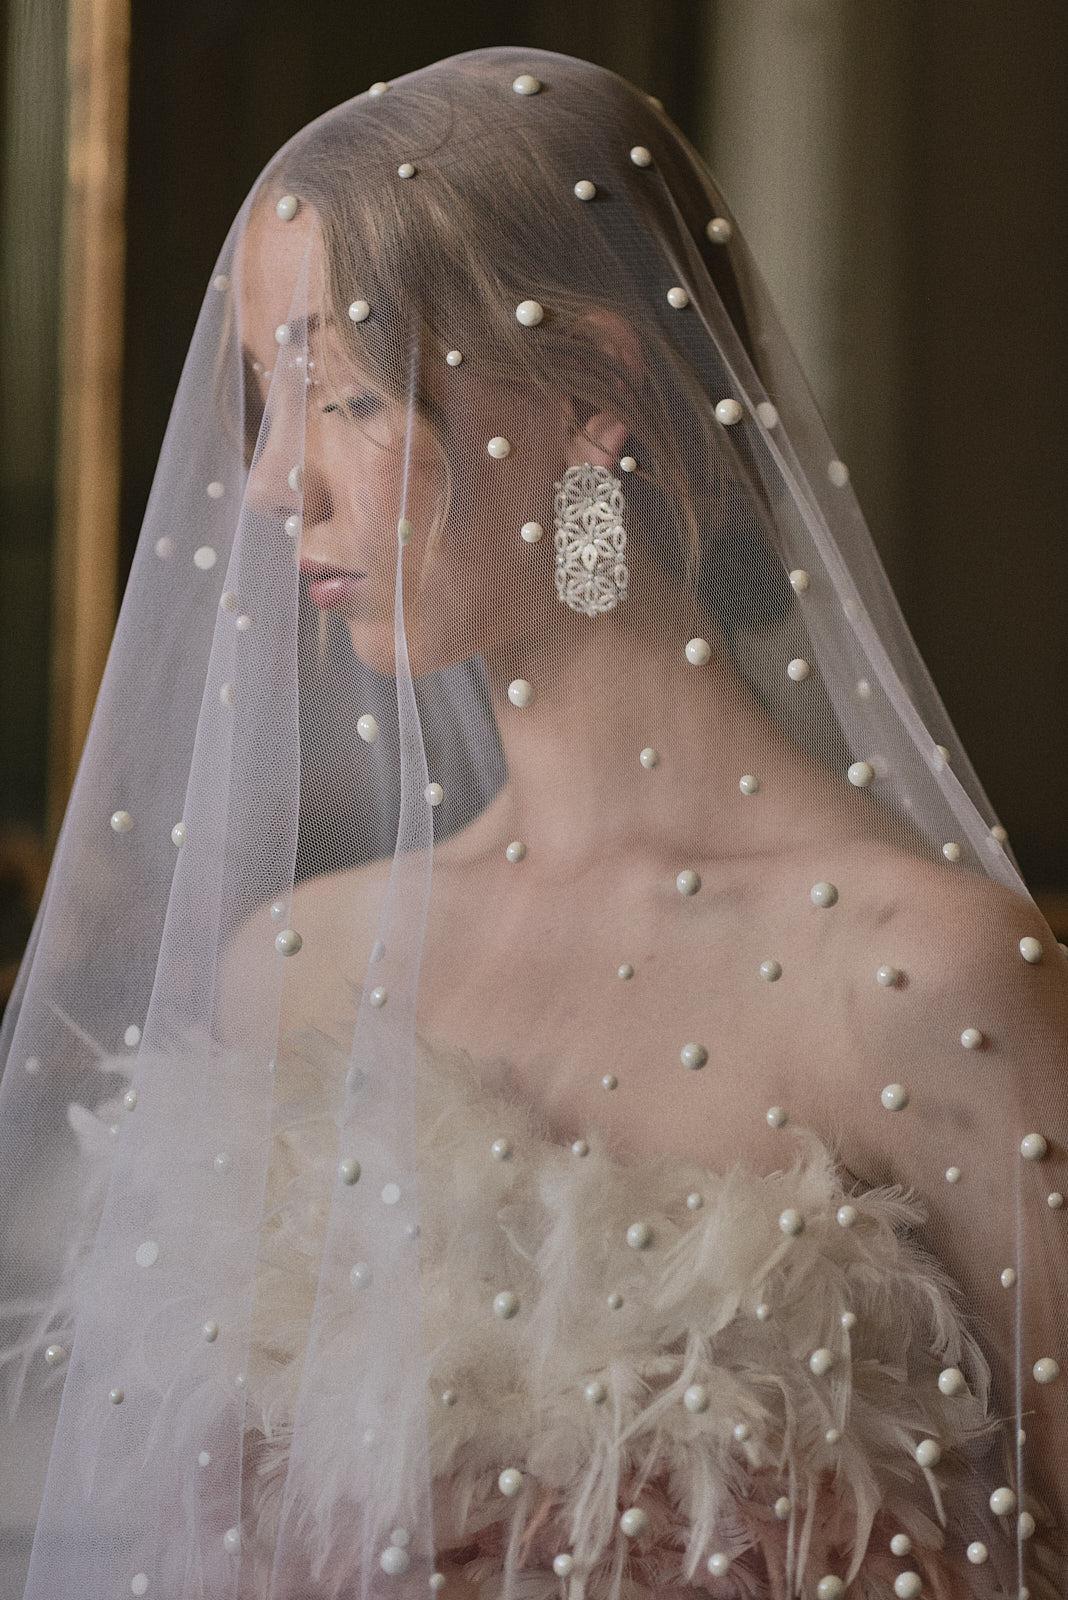 Sephory Photography- Swan Lake Wedding- Ballet Wedding-Unique Bridal Wear- Quirky Wedding Dress- Unique Wedding Dress- Glamorous Wedding- Unconventional Wedding- Bridal Veil